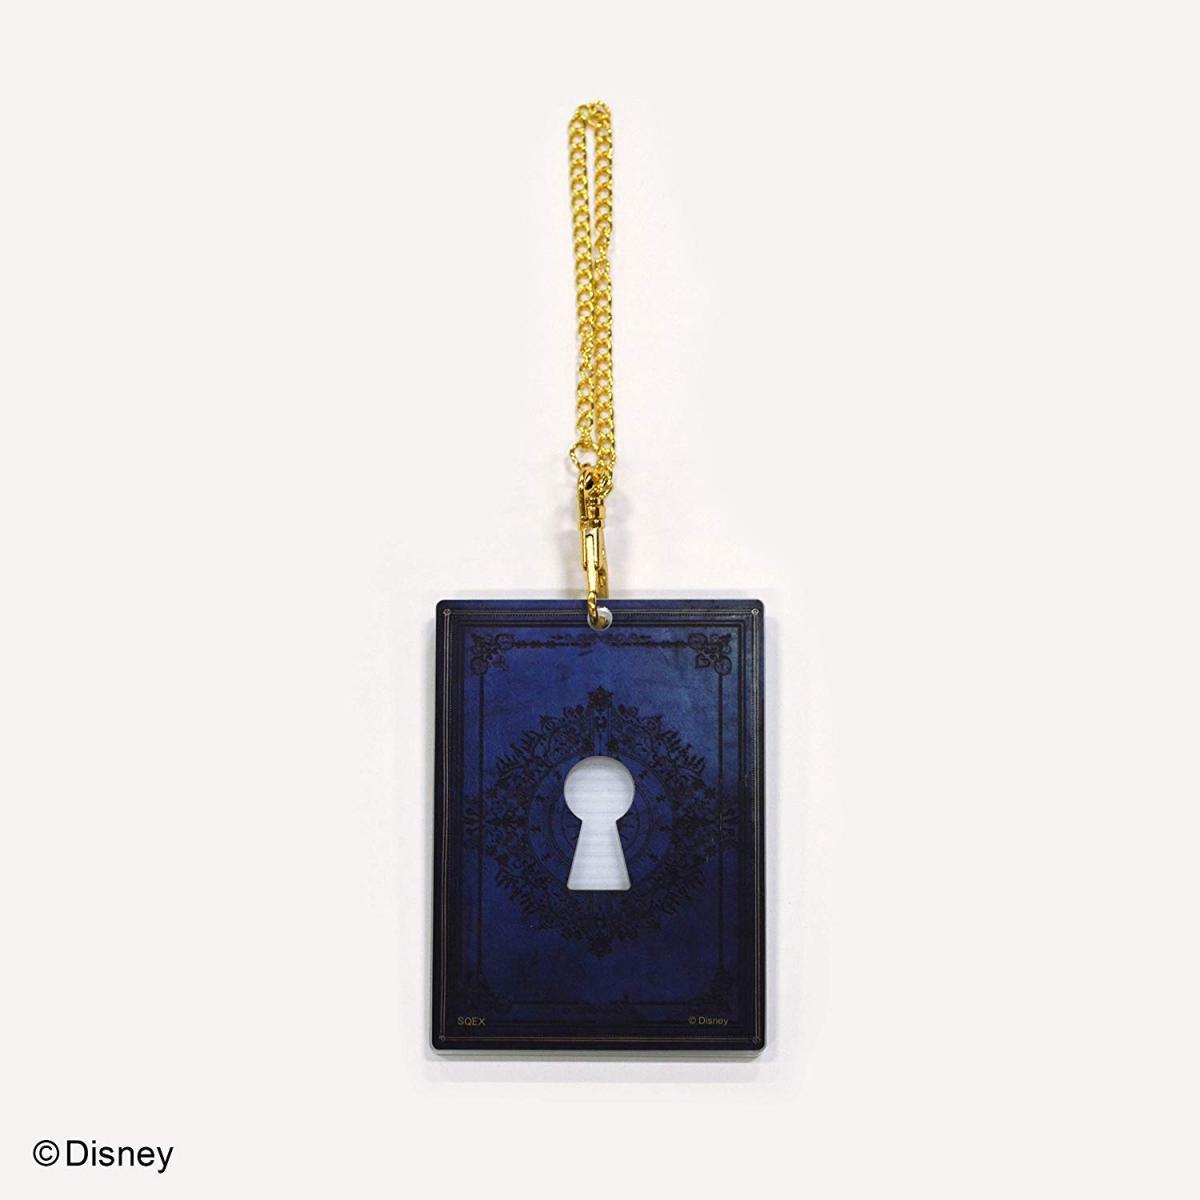 Acrylic Pass Holder - Dawn